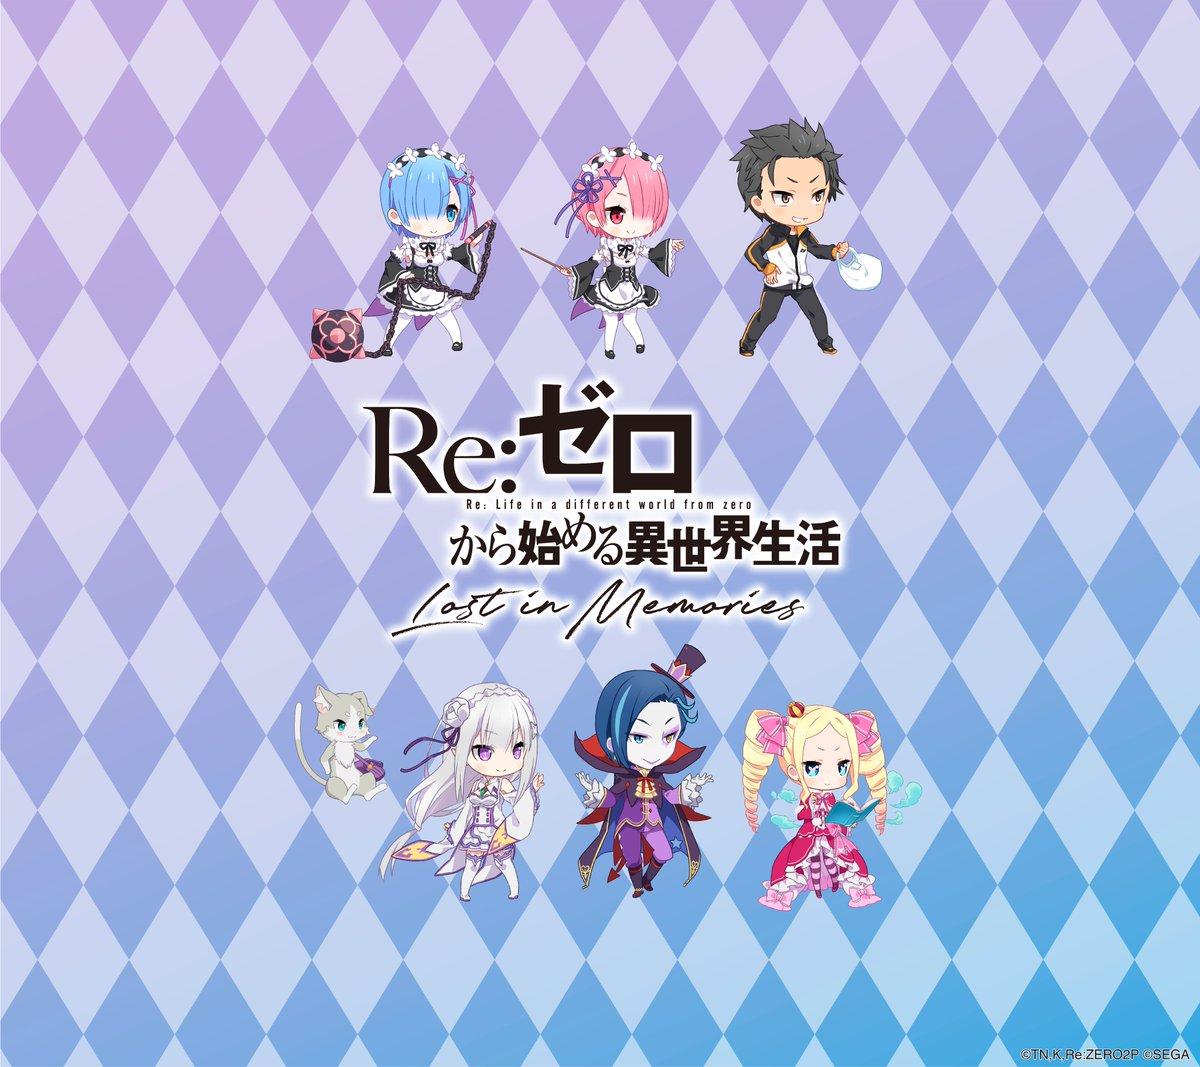 Re ゼロから始める異世界生活 Lost In Memories リゼロス 公式 壁紙 Android用 リゼロス Rezero リゼロ